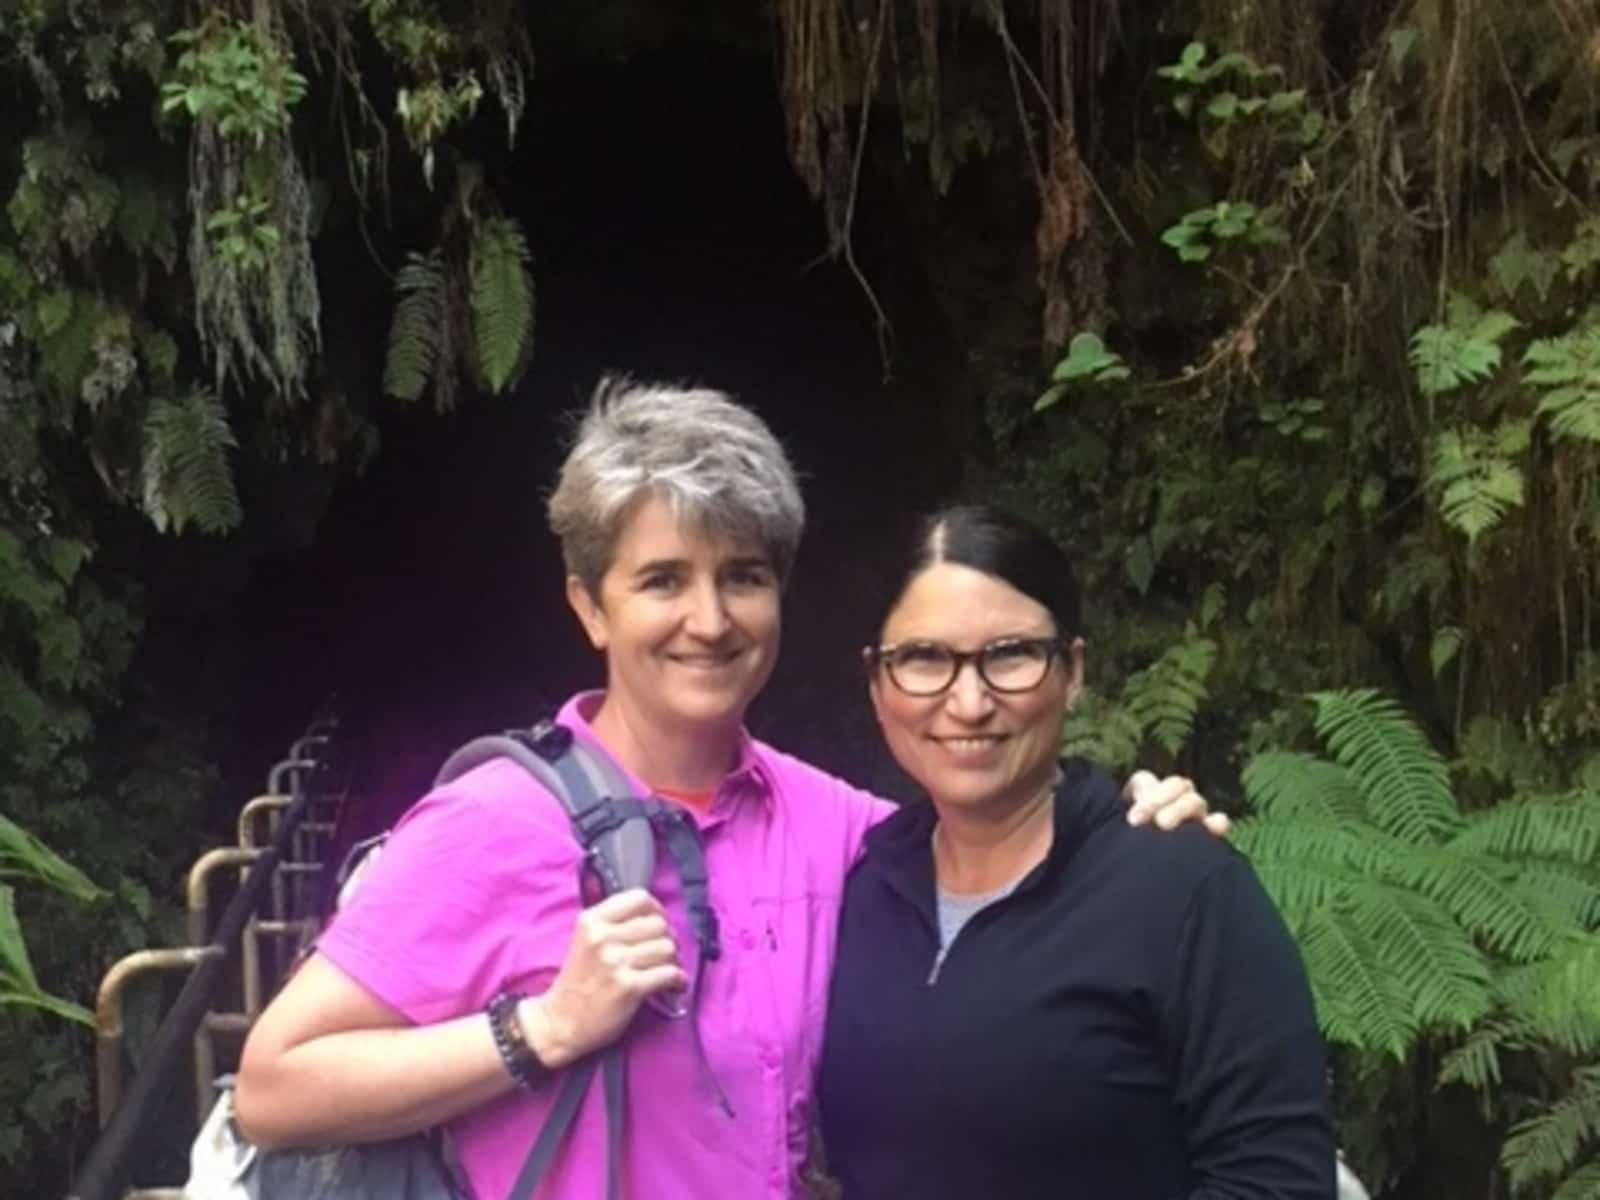 Deanne & Greta from Edmonton, Alberta, Canada